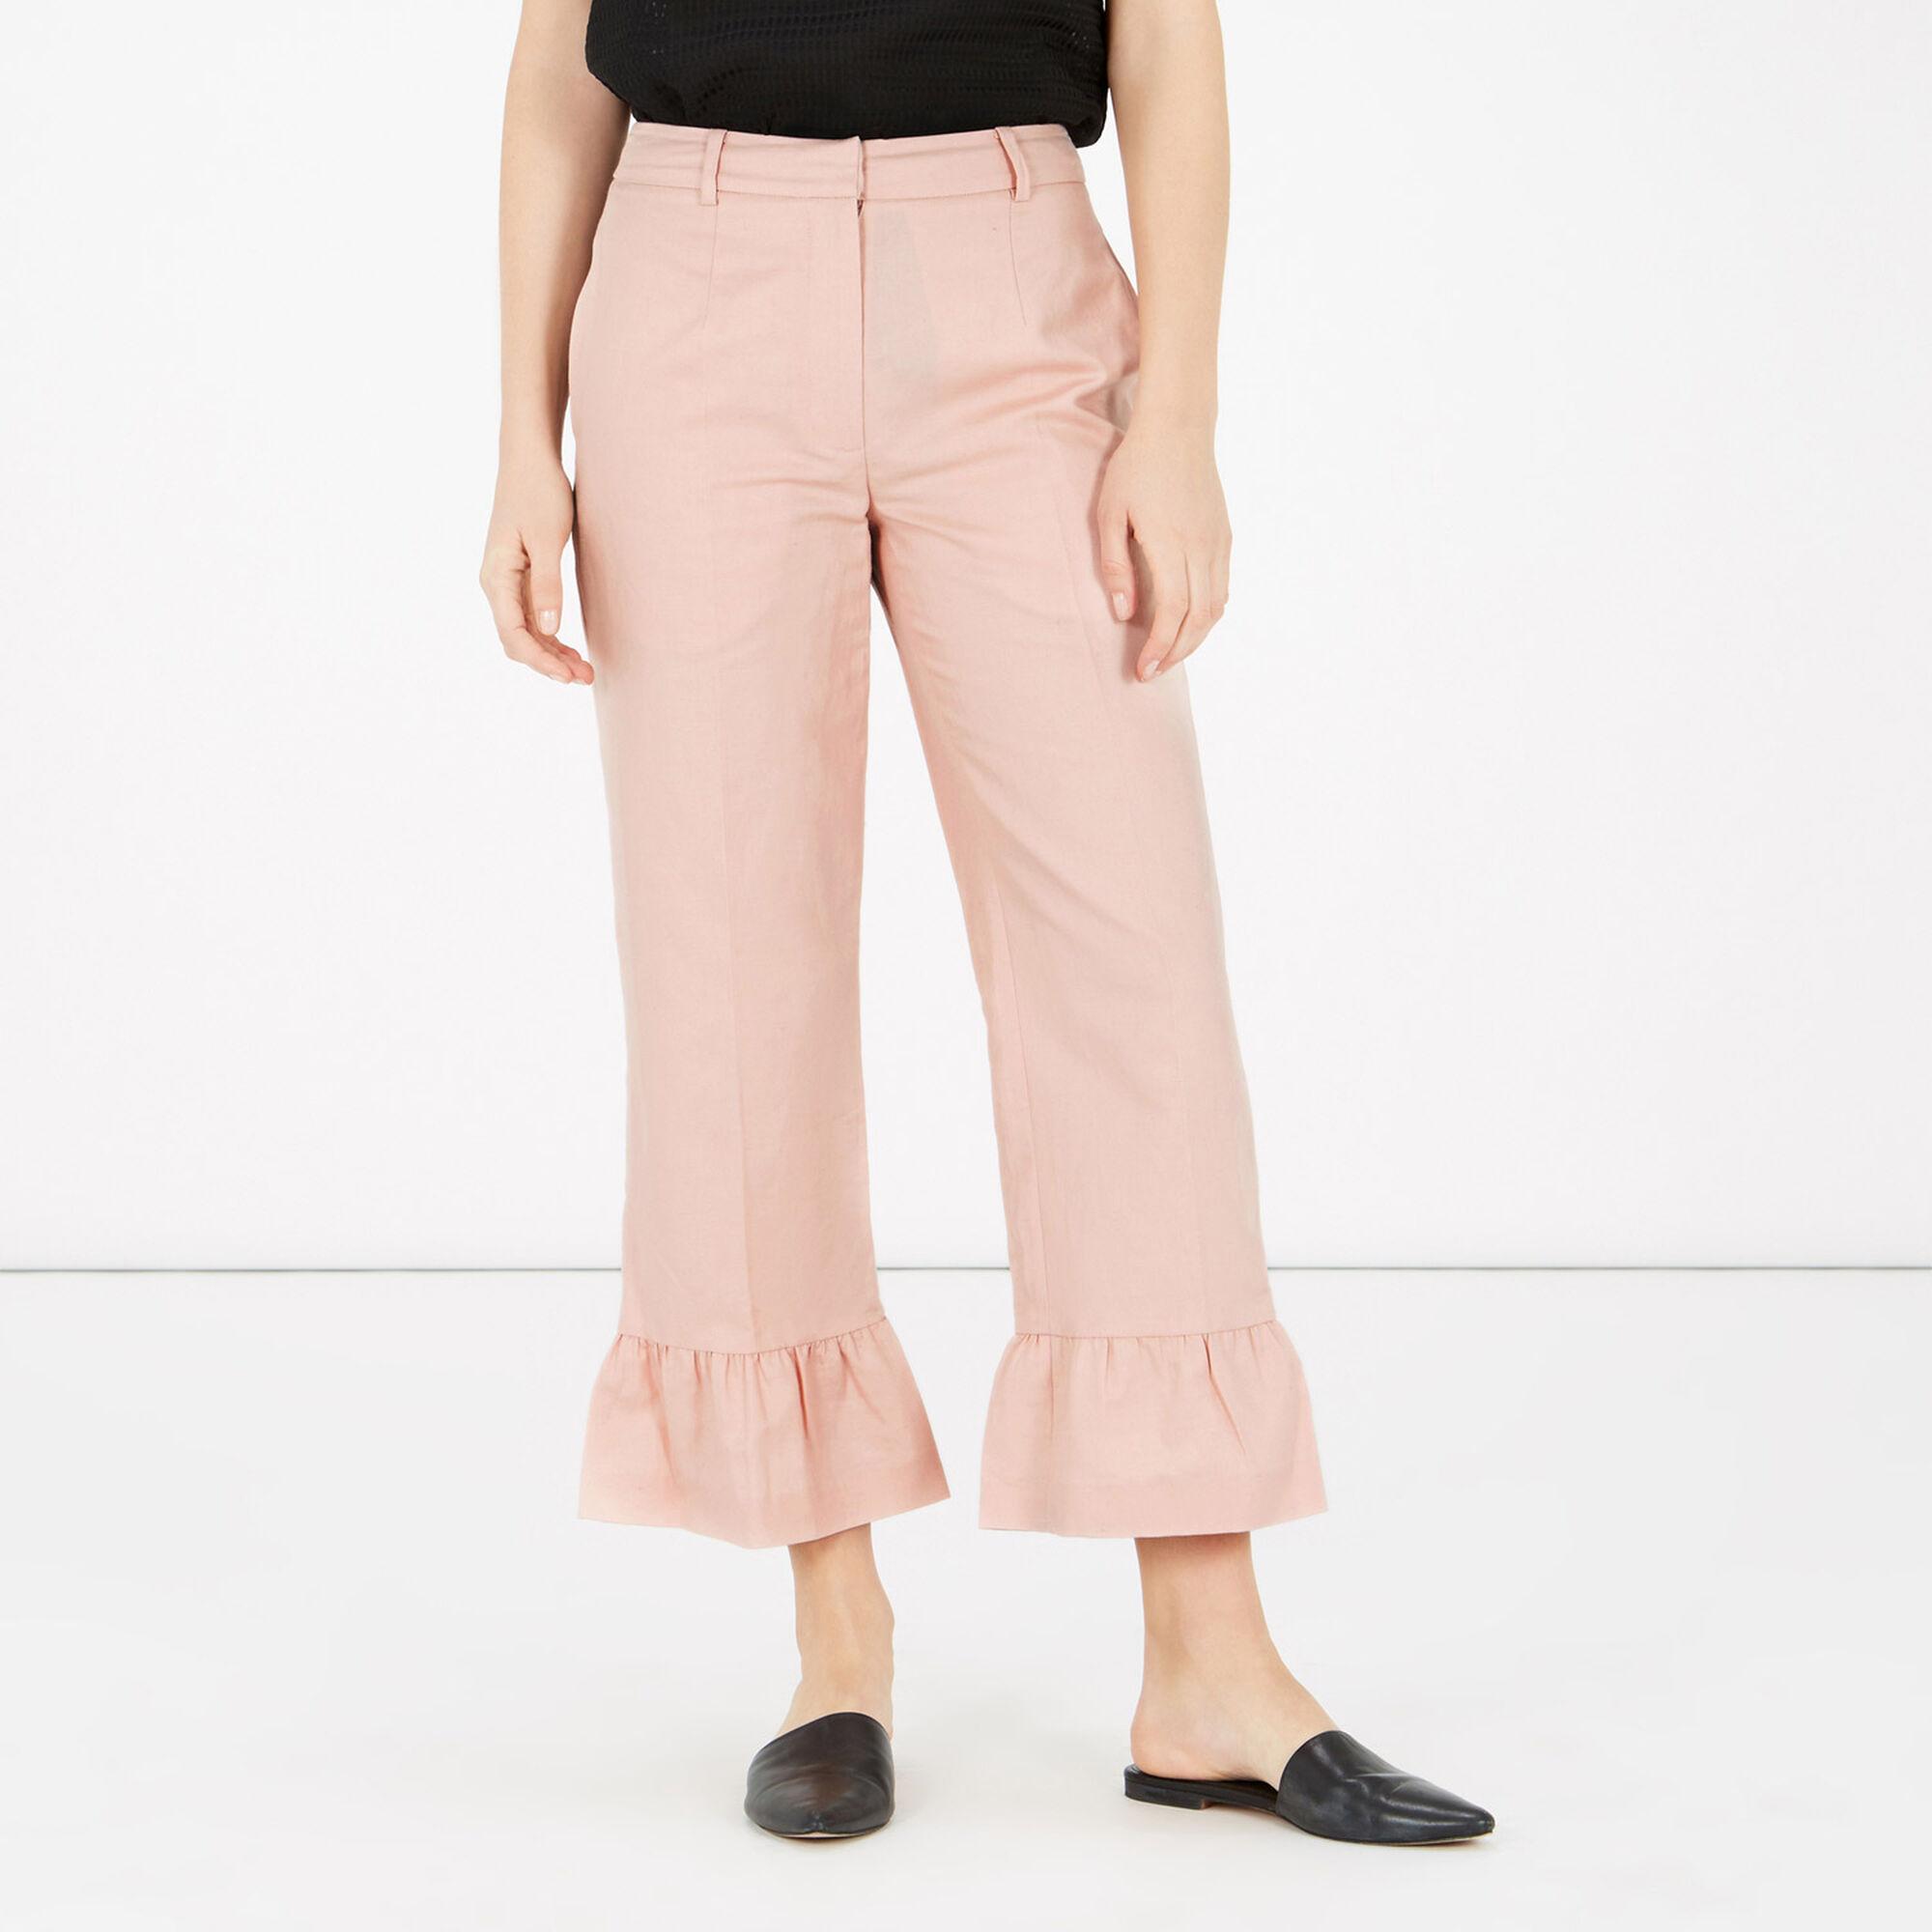 Warehouse, FRILL HEM TROUSERS Light Pink 1